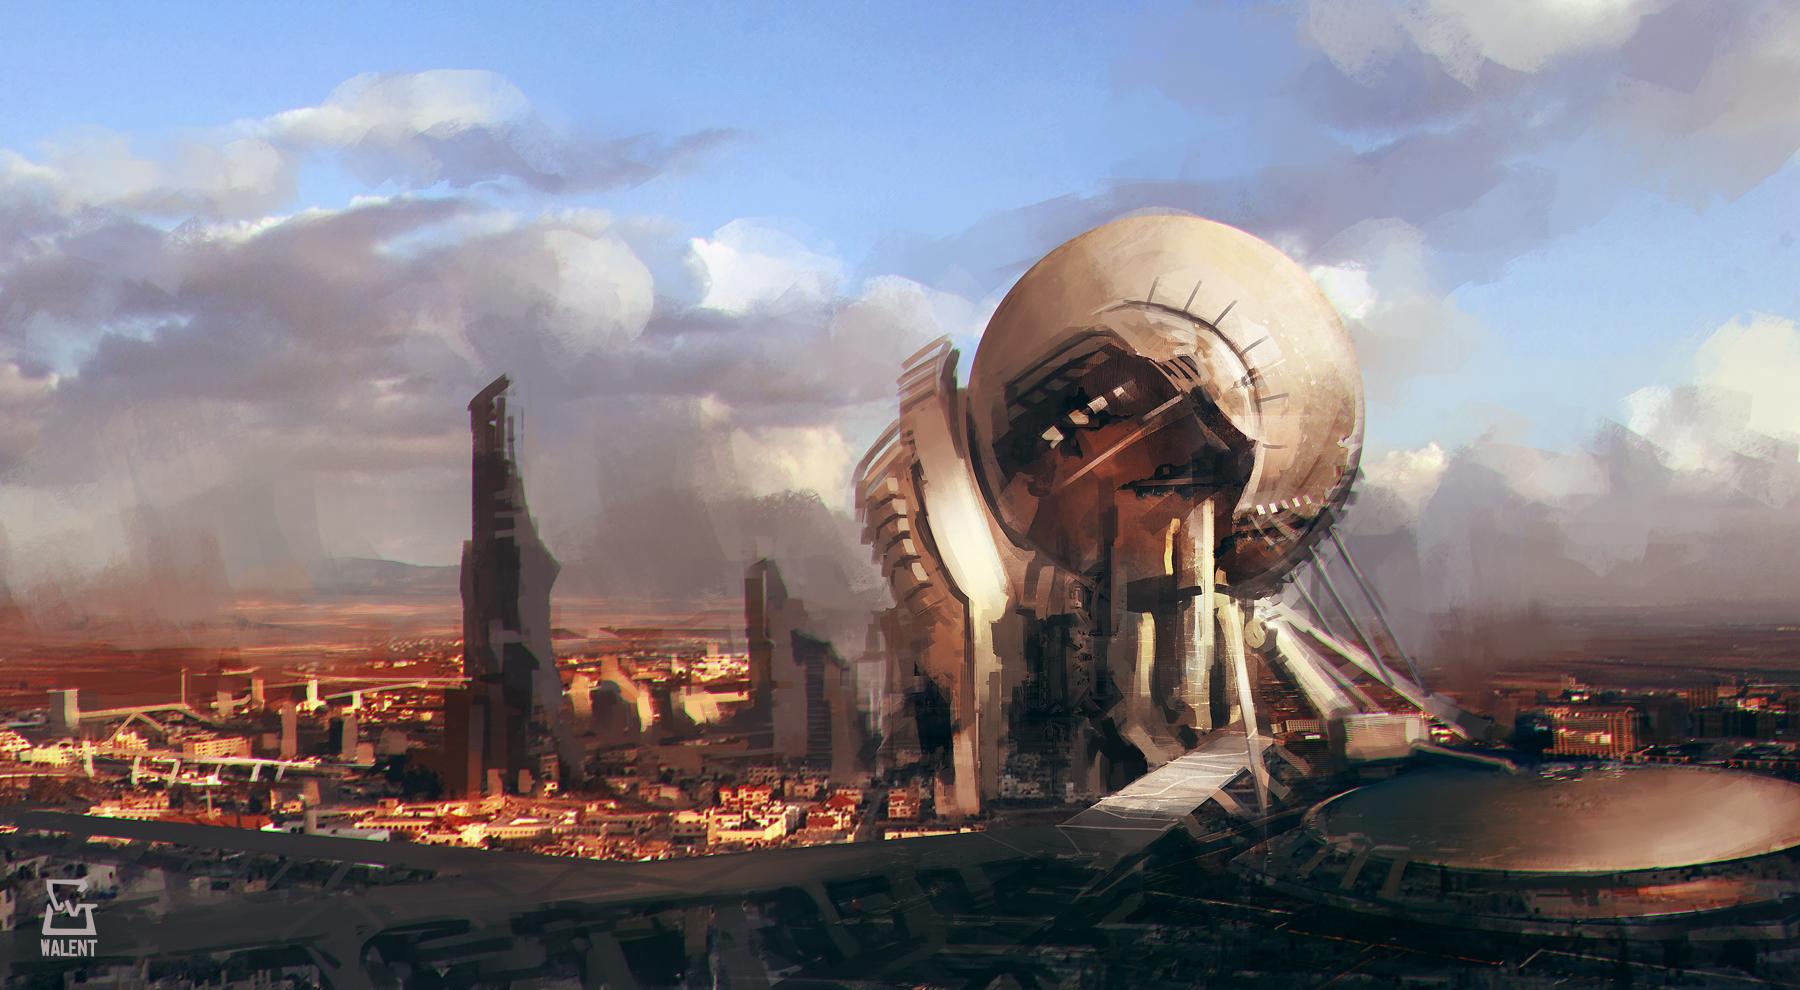 Futuristic City by vladgheneli